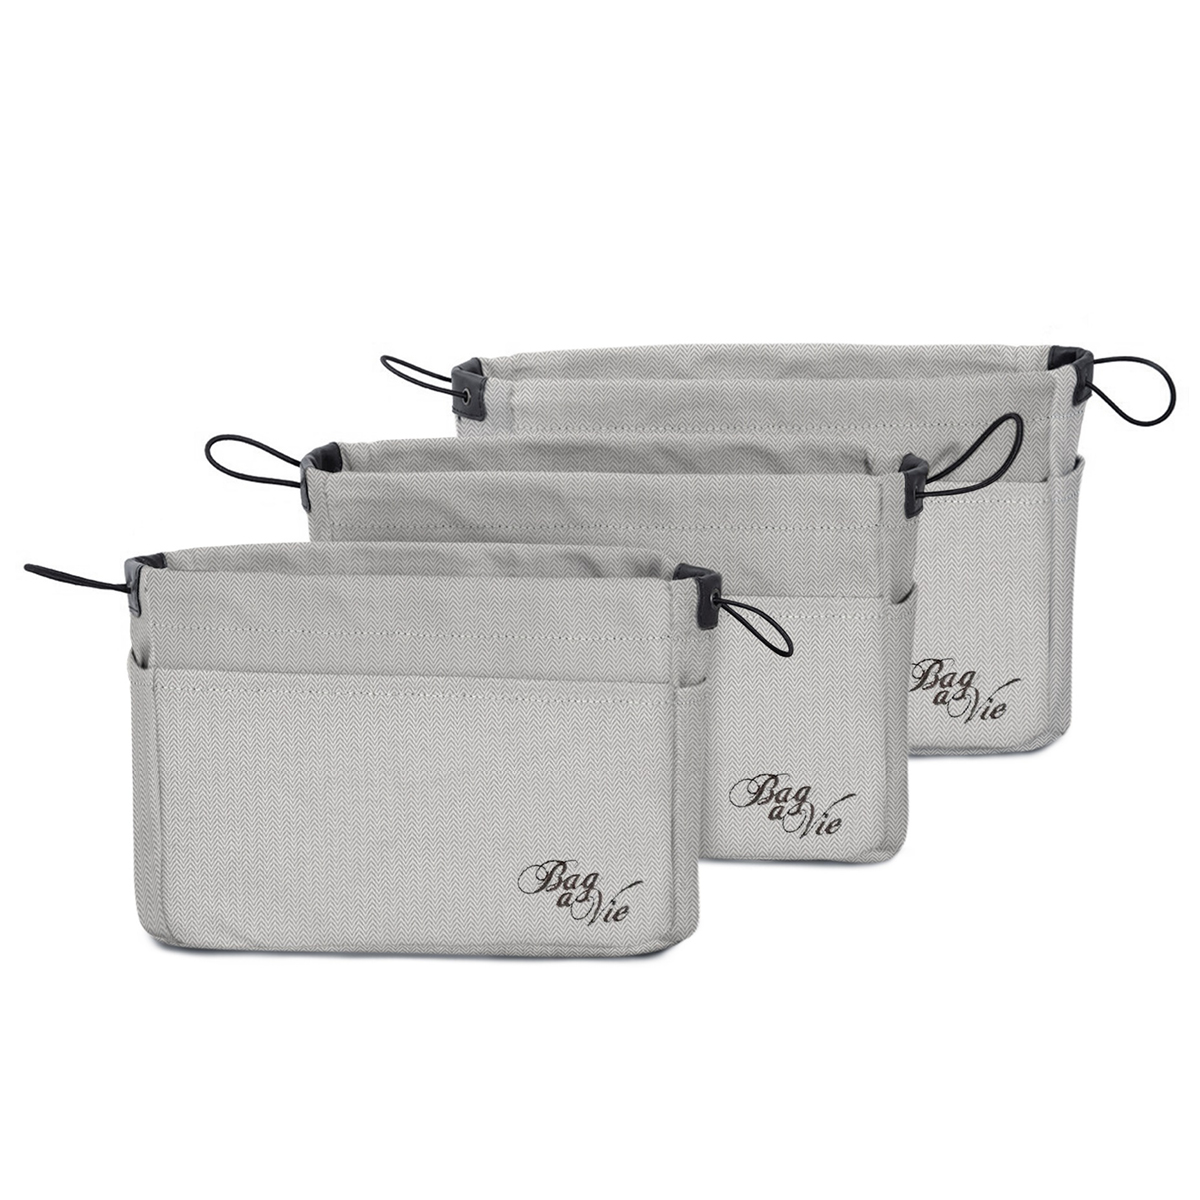 Deluxe Handbag Organizer 3 Pack